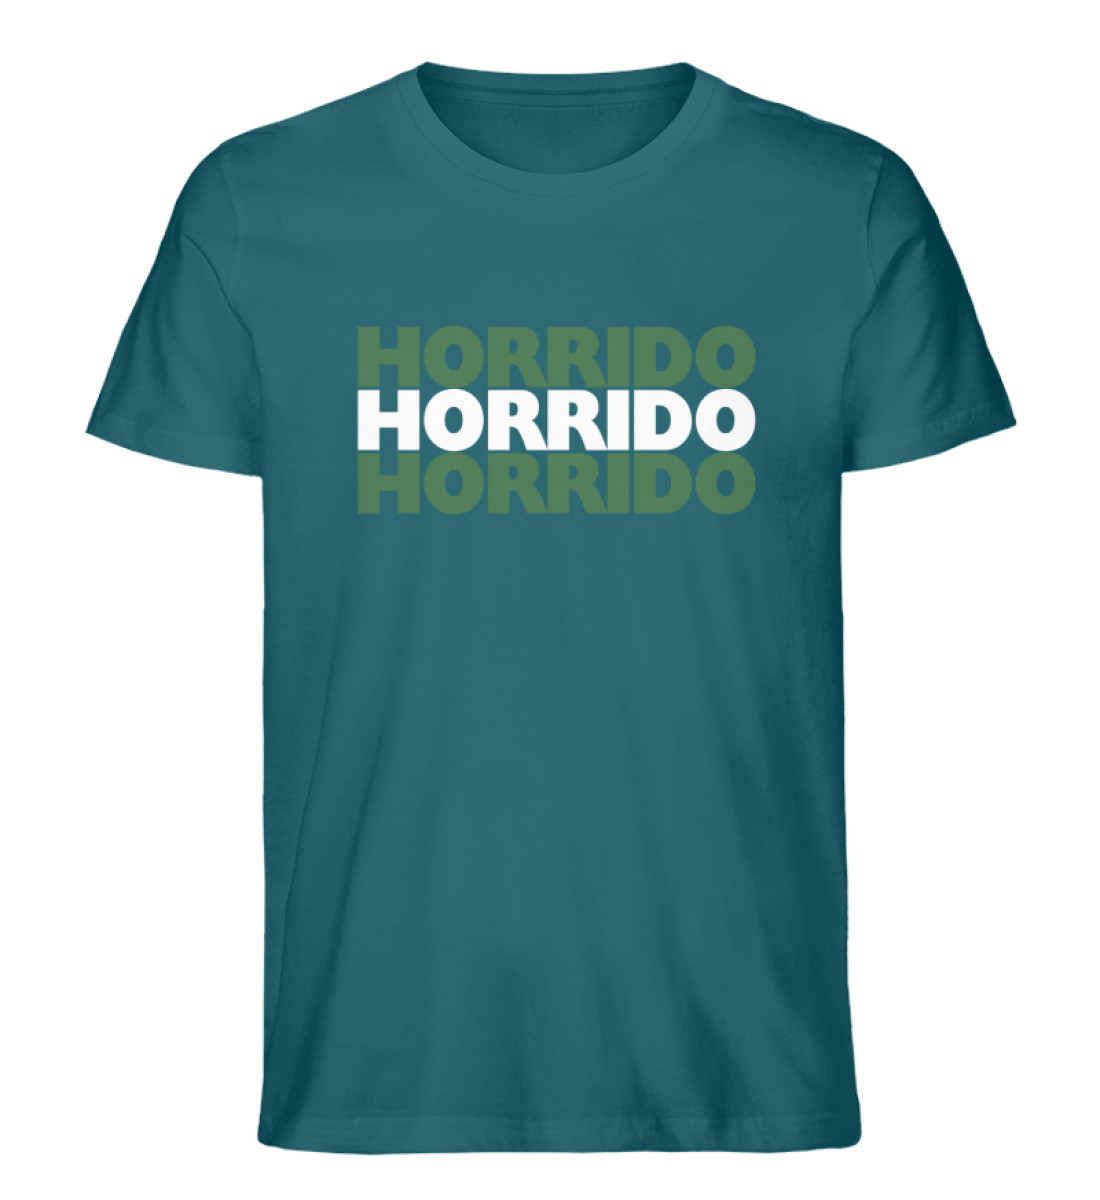 Horrido - Herren Premium Organic Shirt-6889